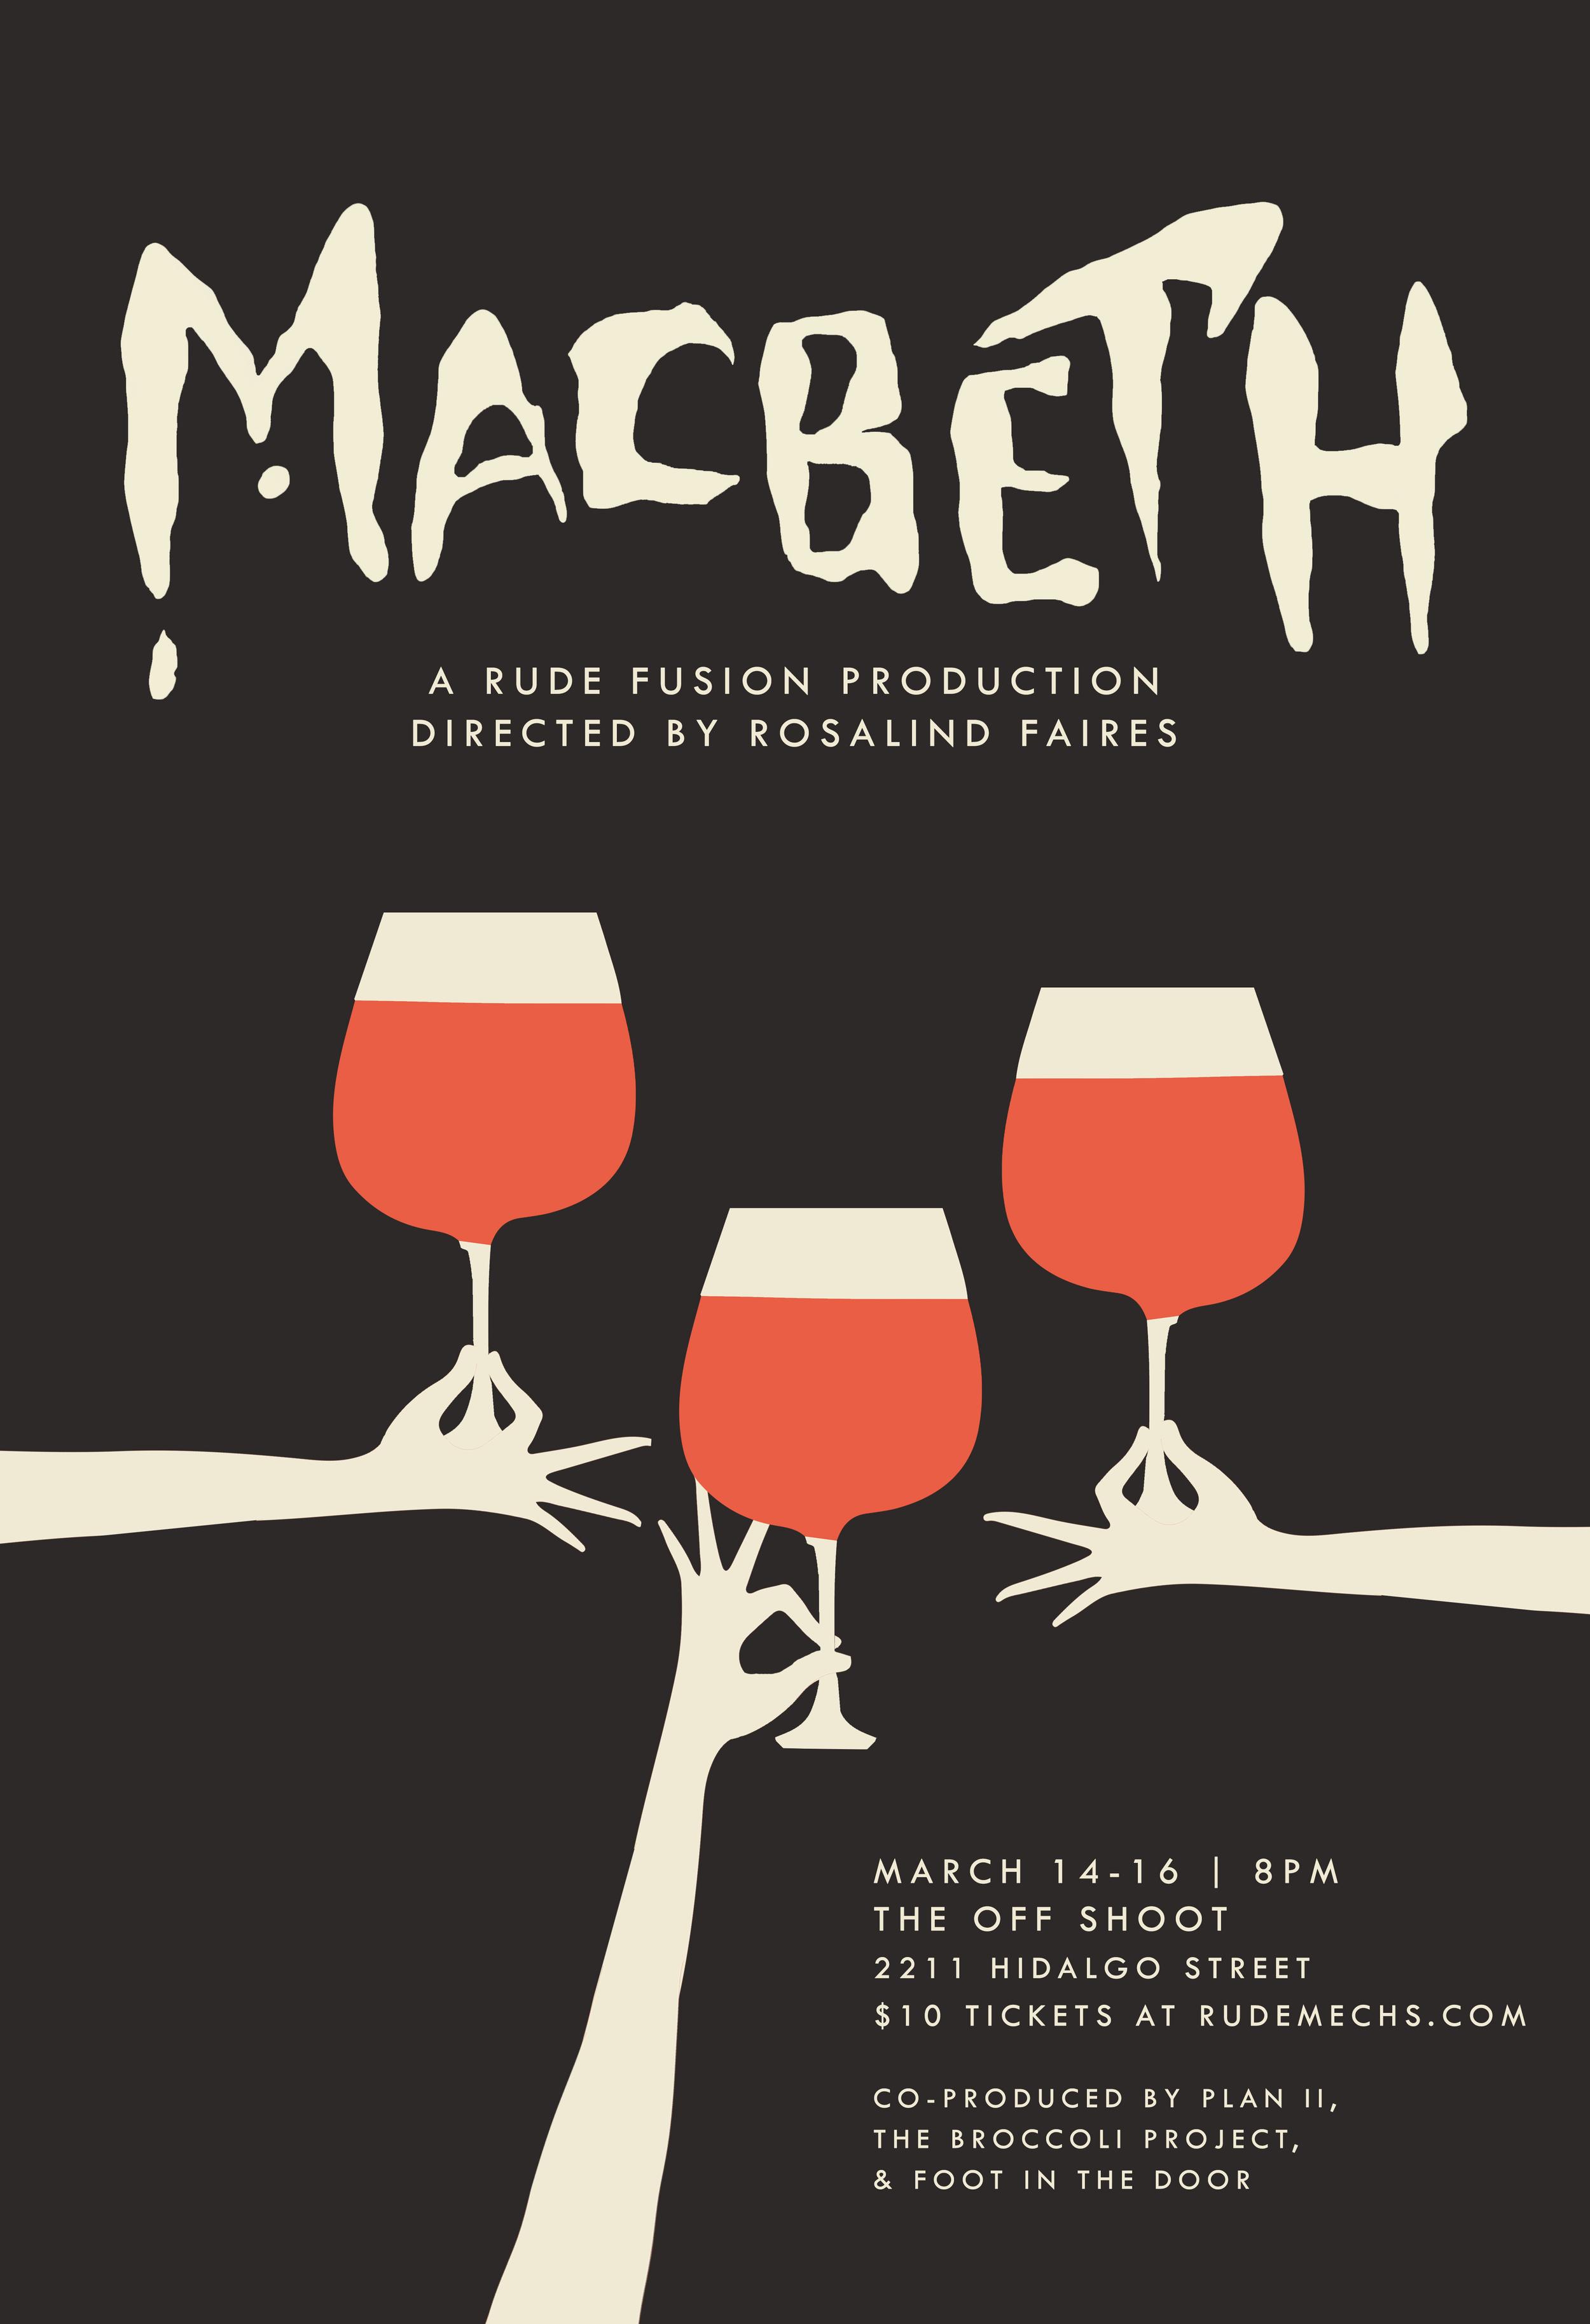 Macbeth_Poster_ToPrint.jpg